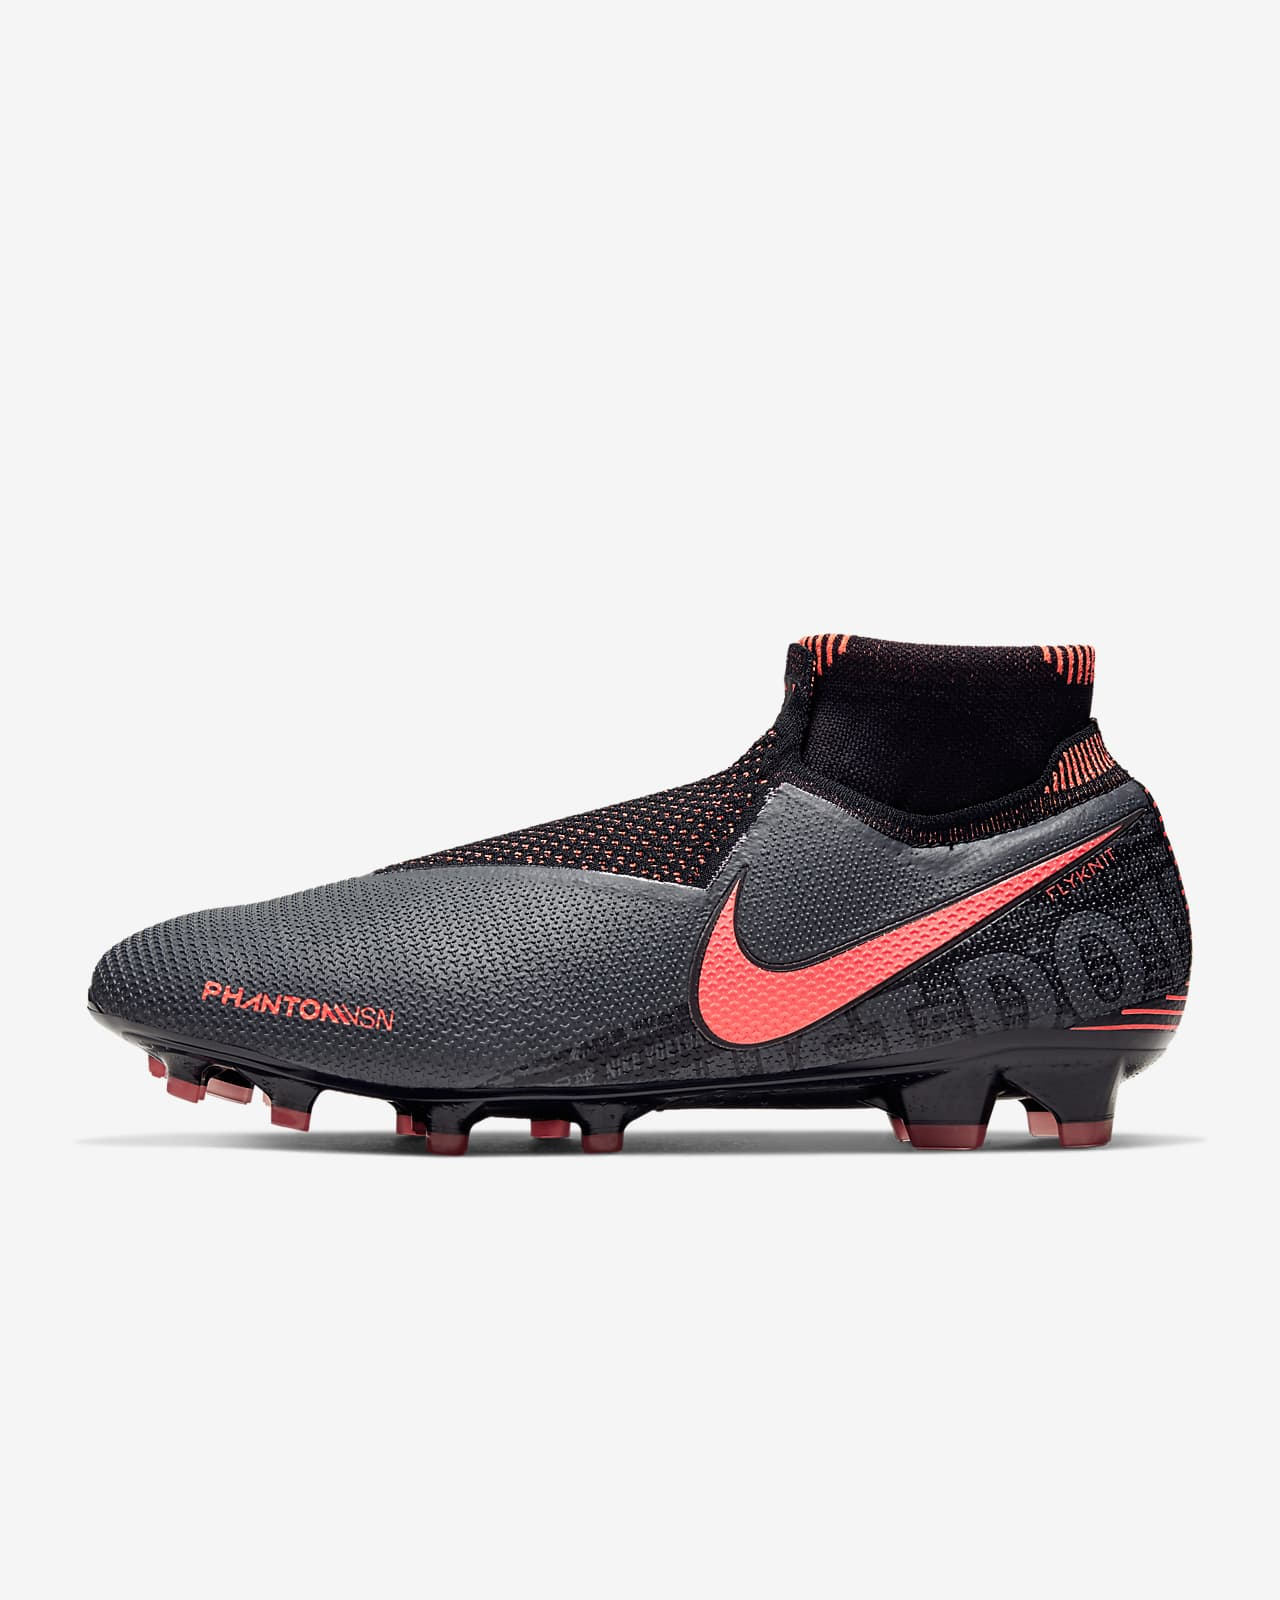 Nike Phantom Vision Elite Dynamic Fit FG Firm-Ground Football Boot